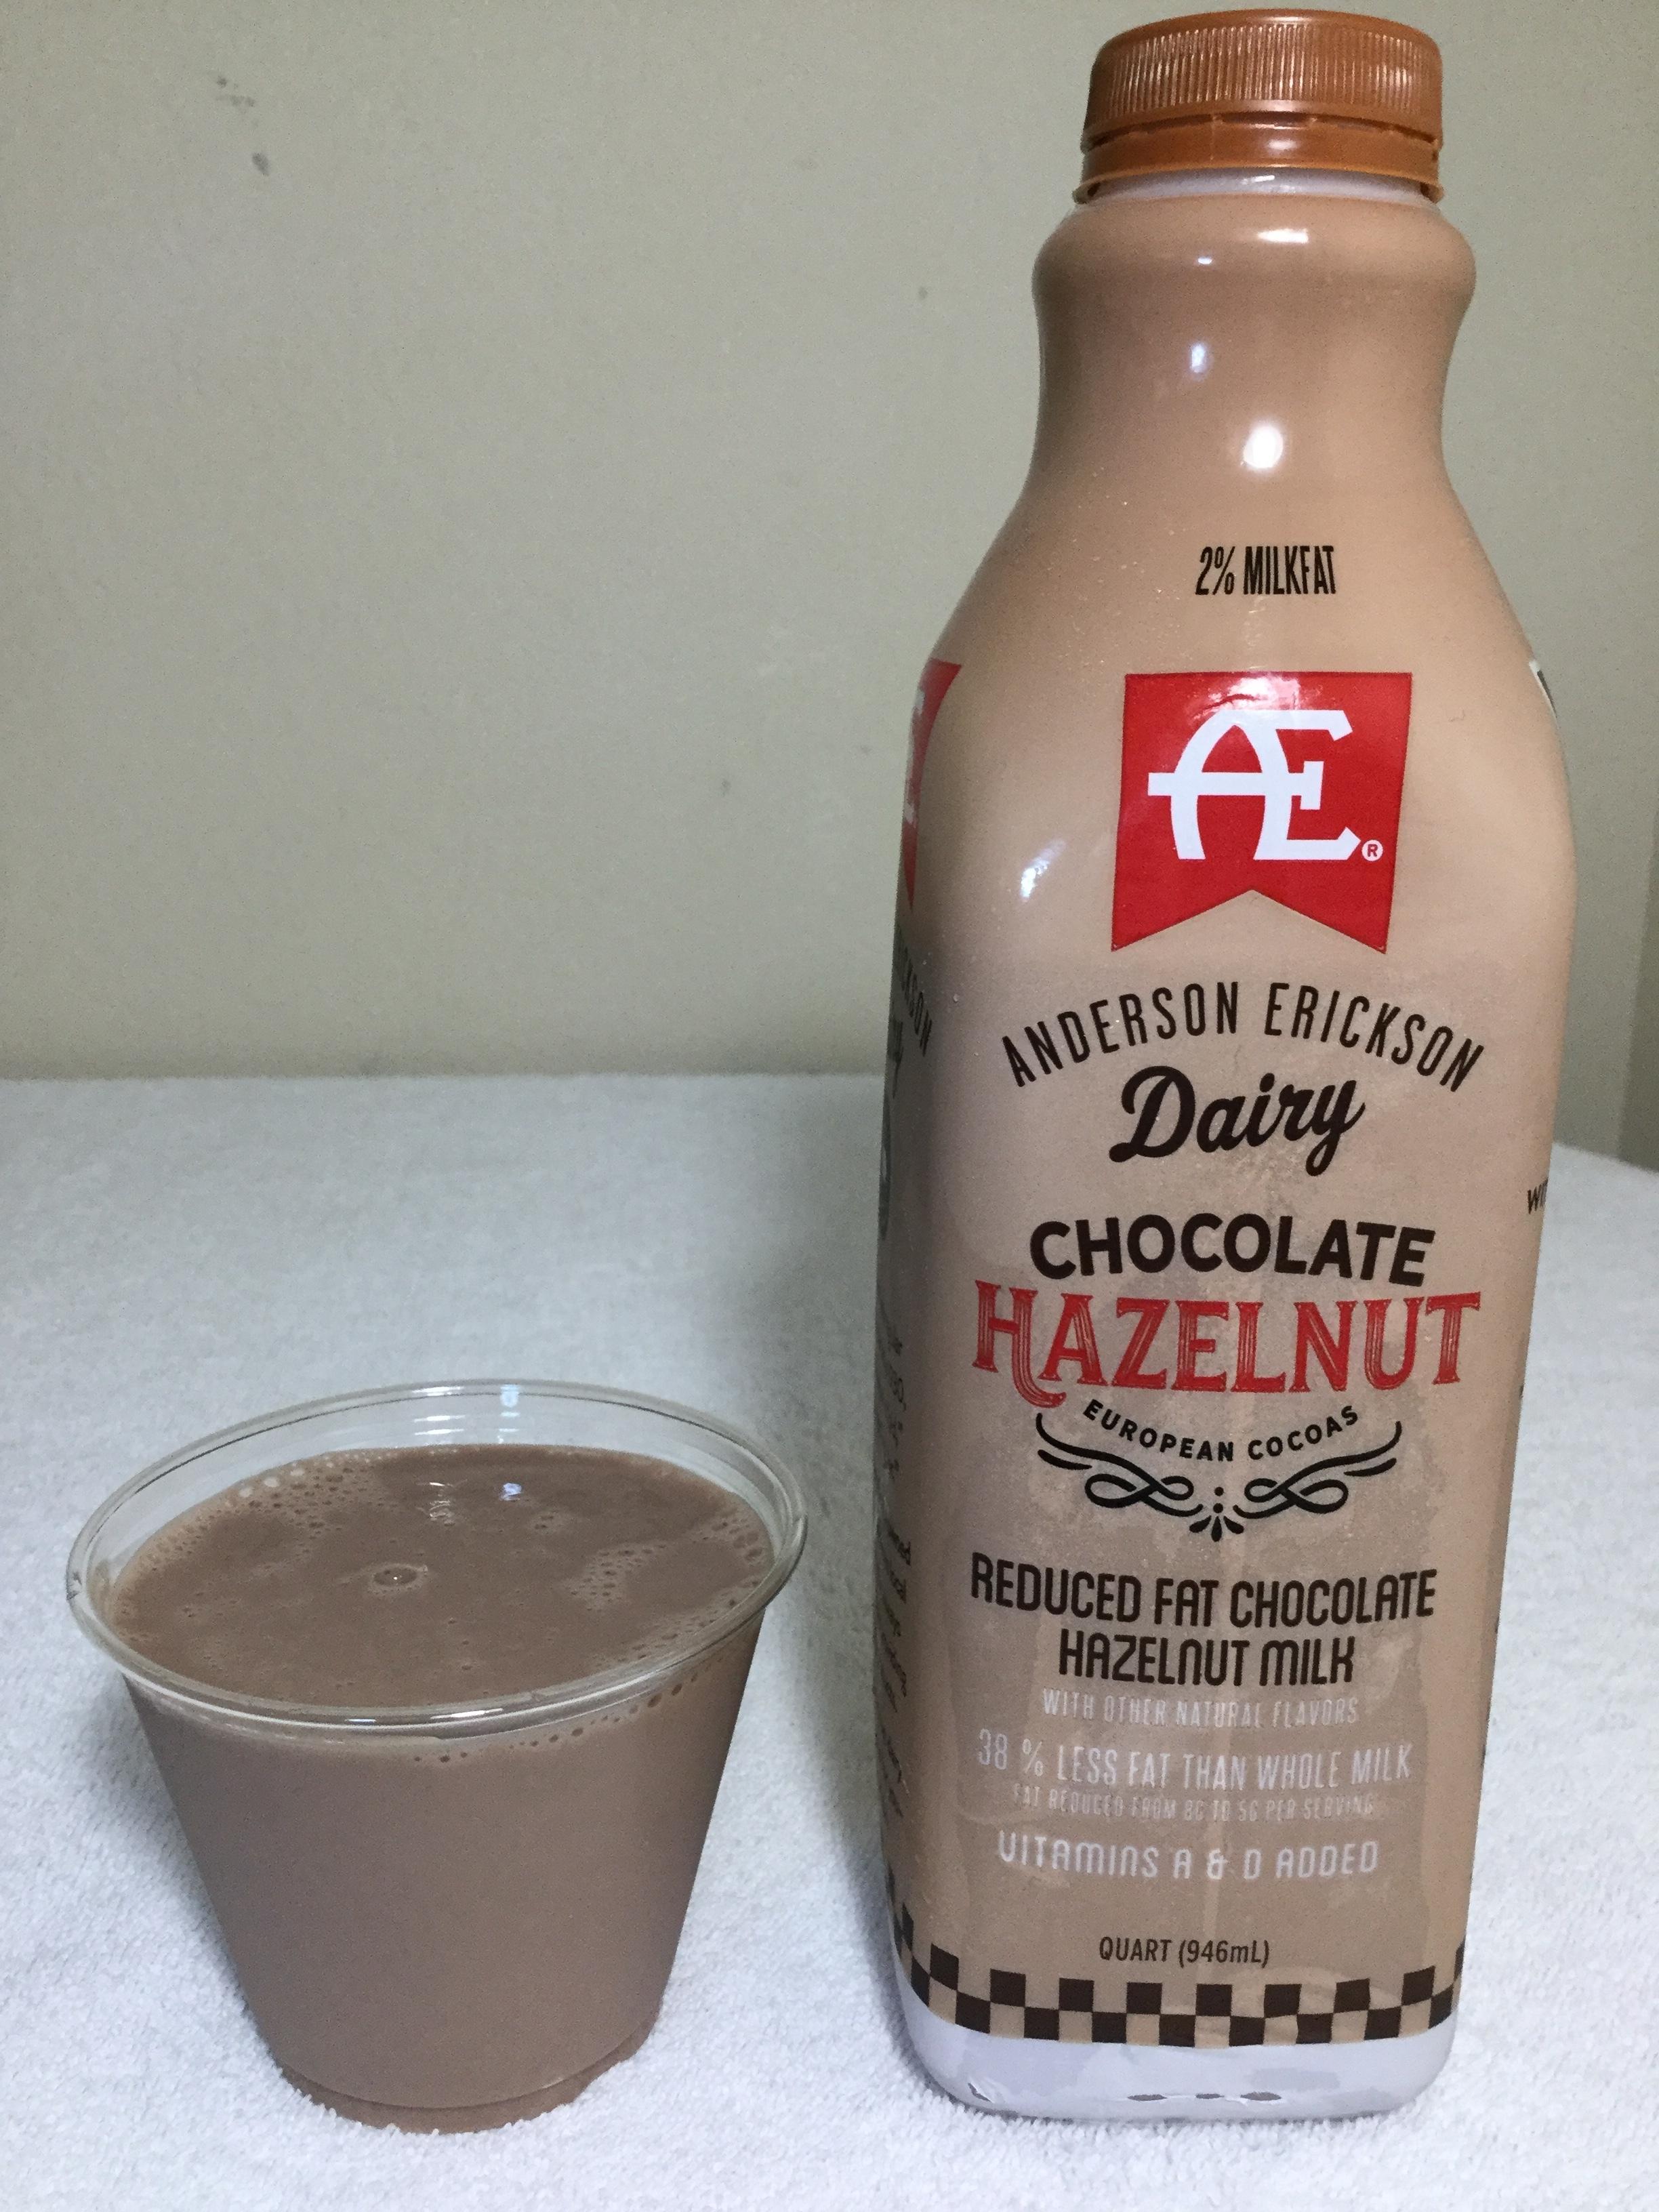 Anderson Erickson Chocolate Hazelnut Milk Cup